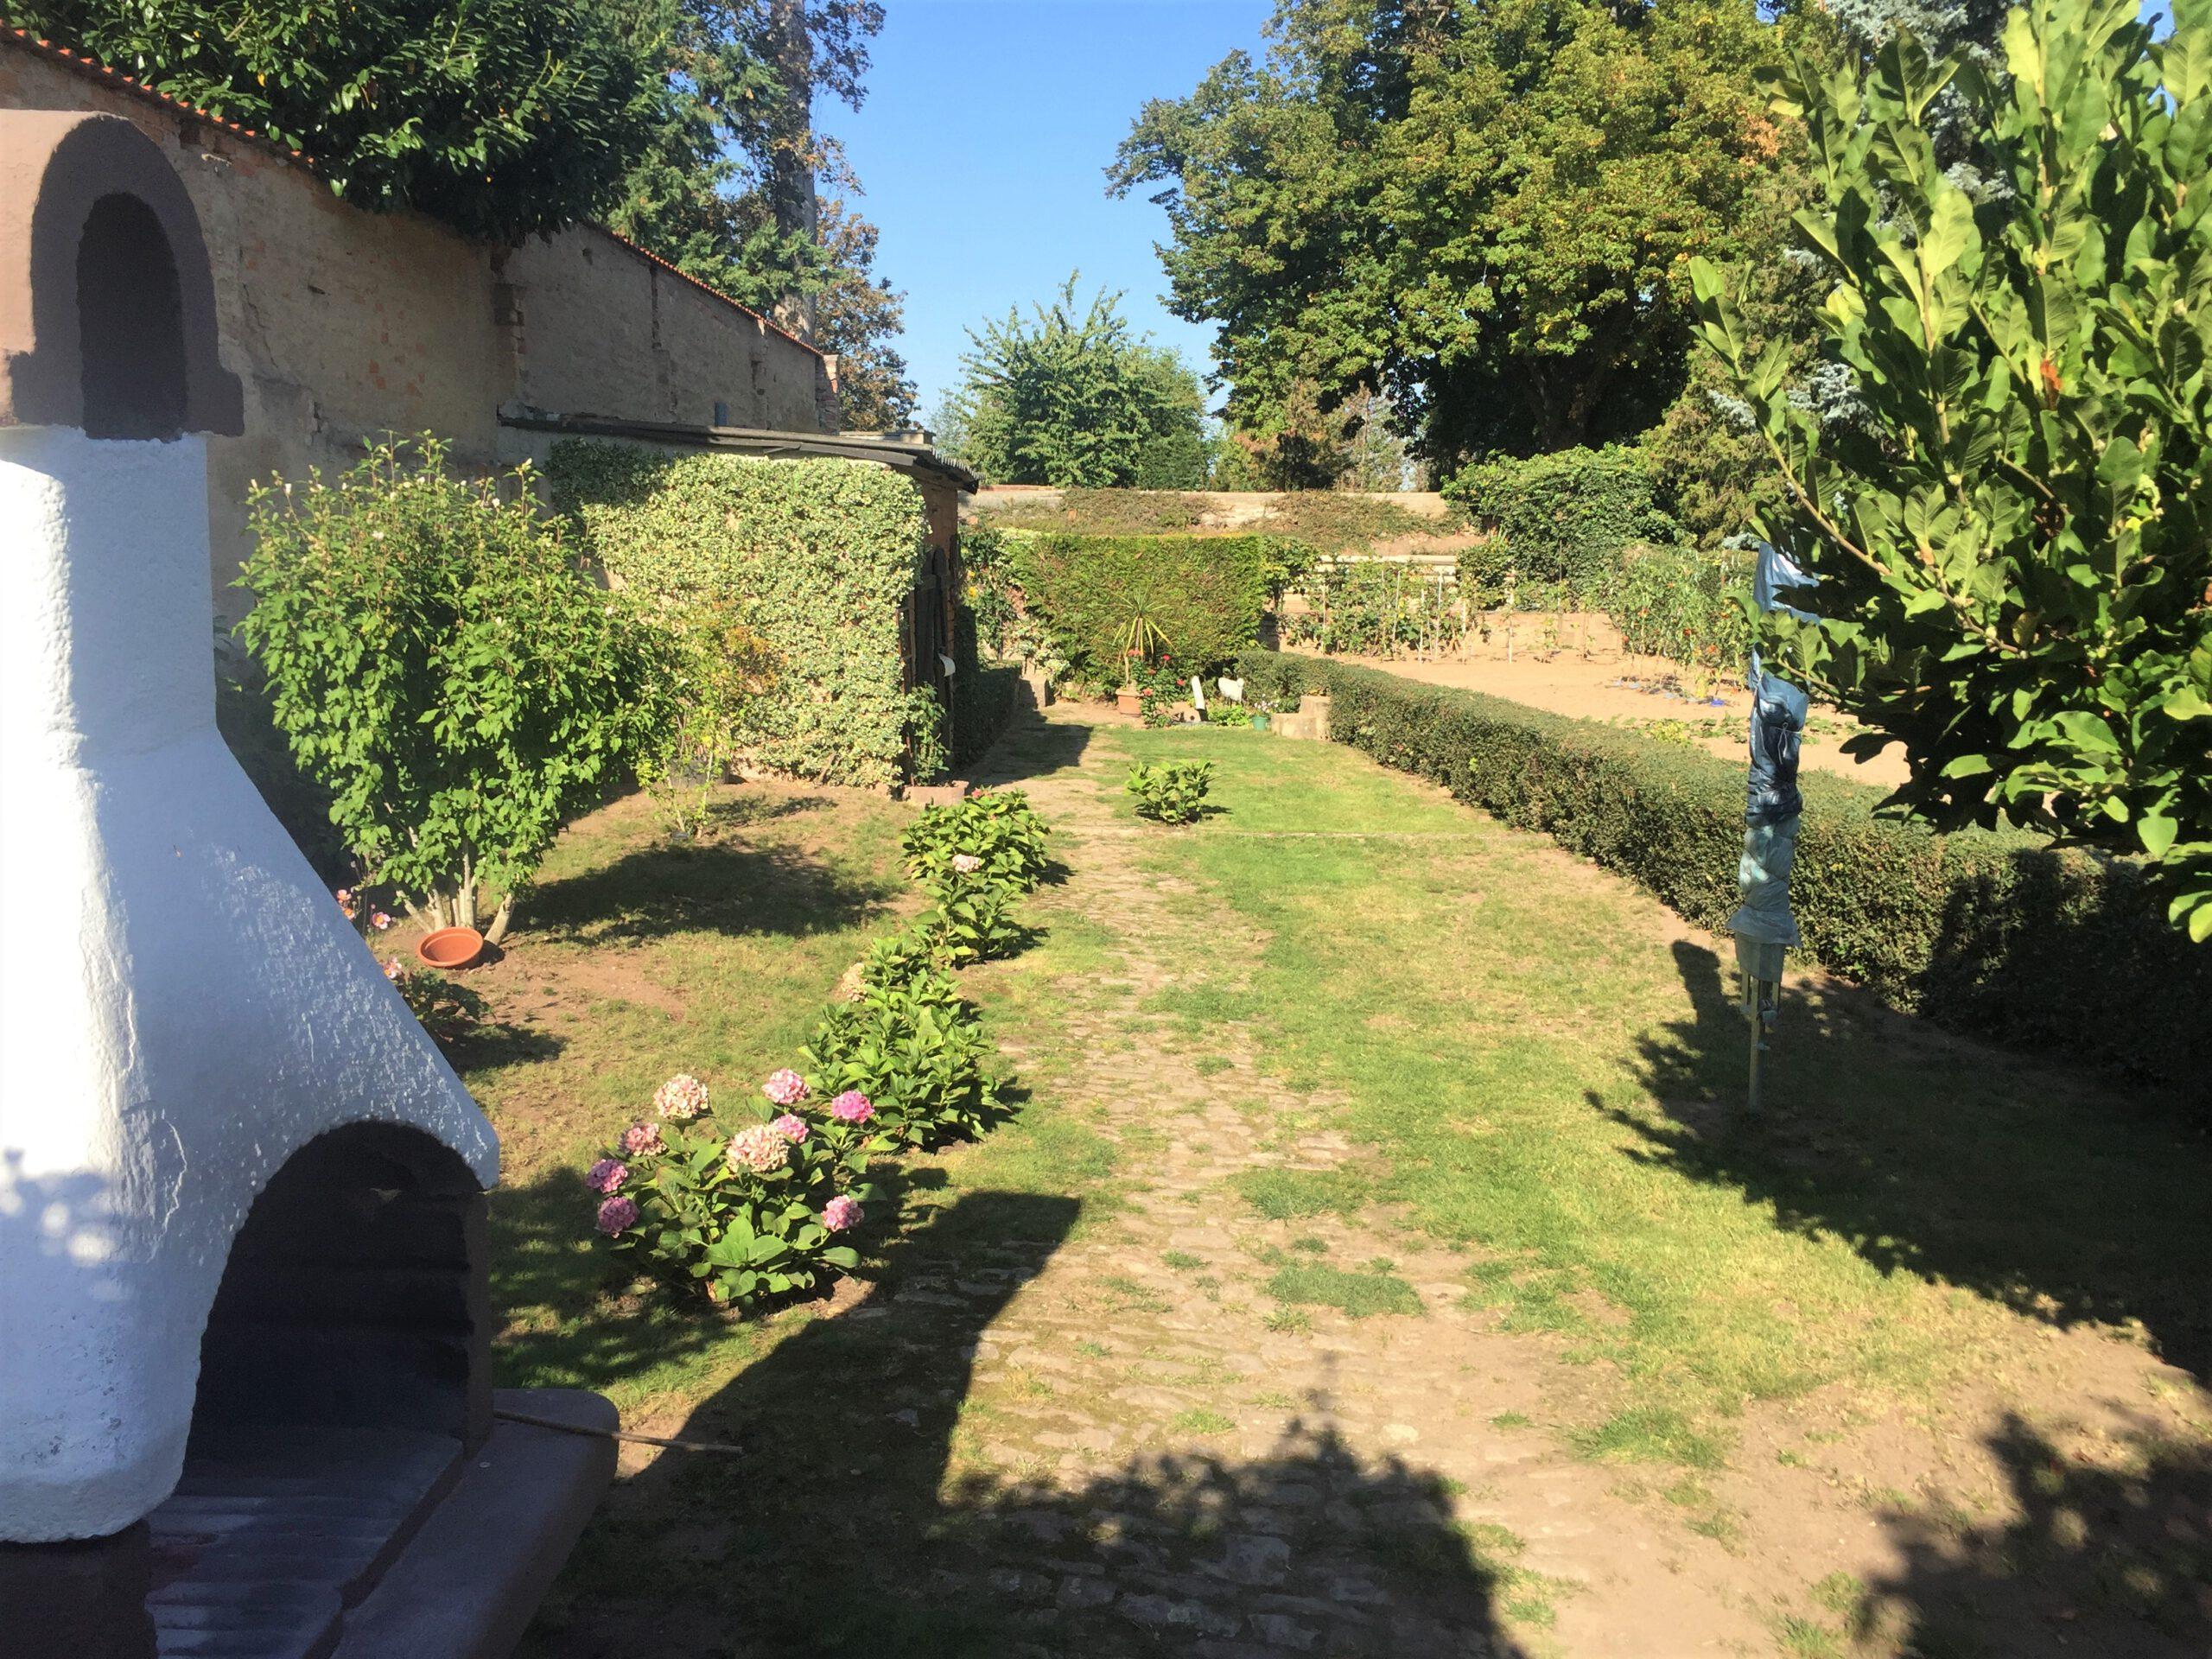 Einfamilienhaus in Gnölbzig - Blick in den Garten